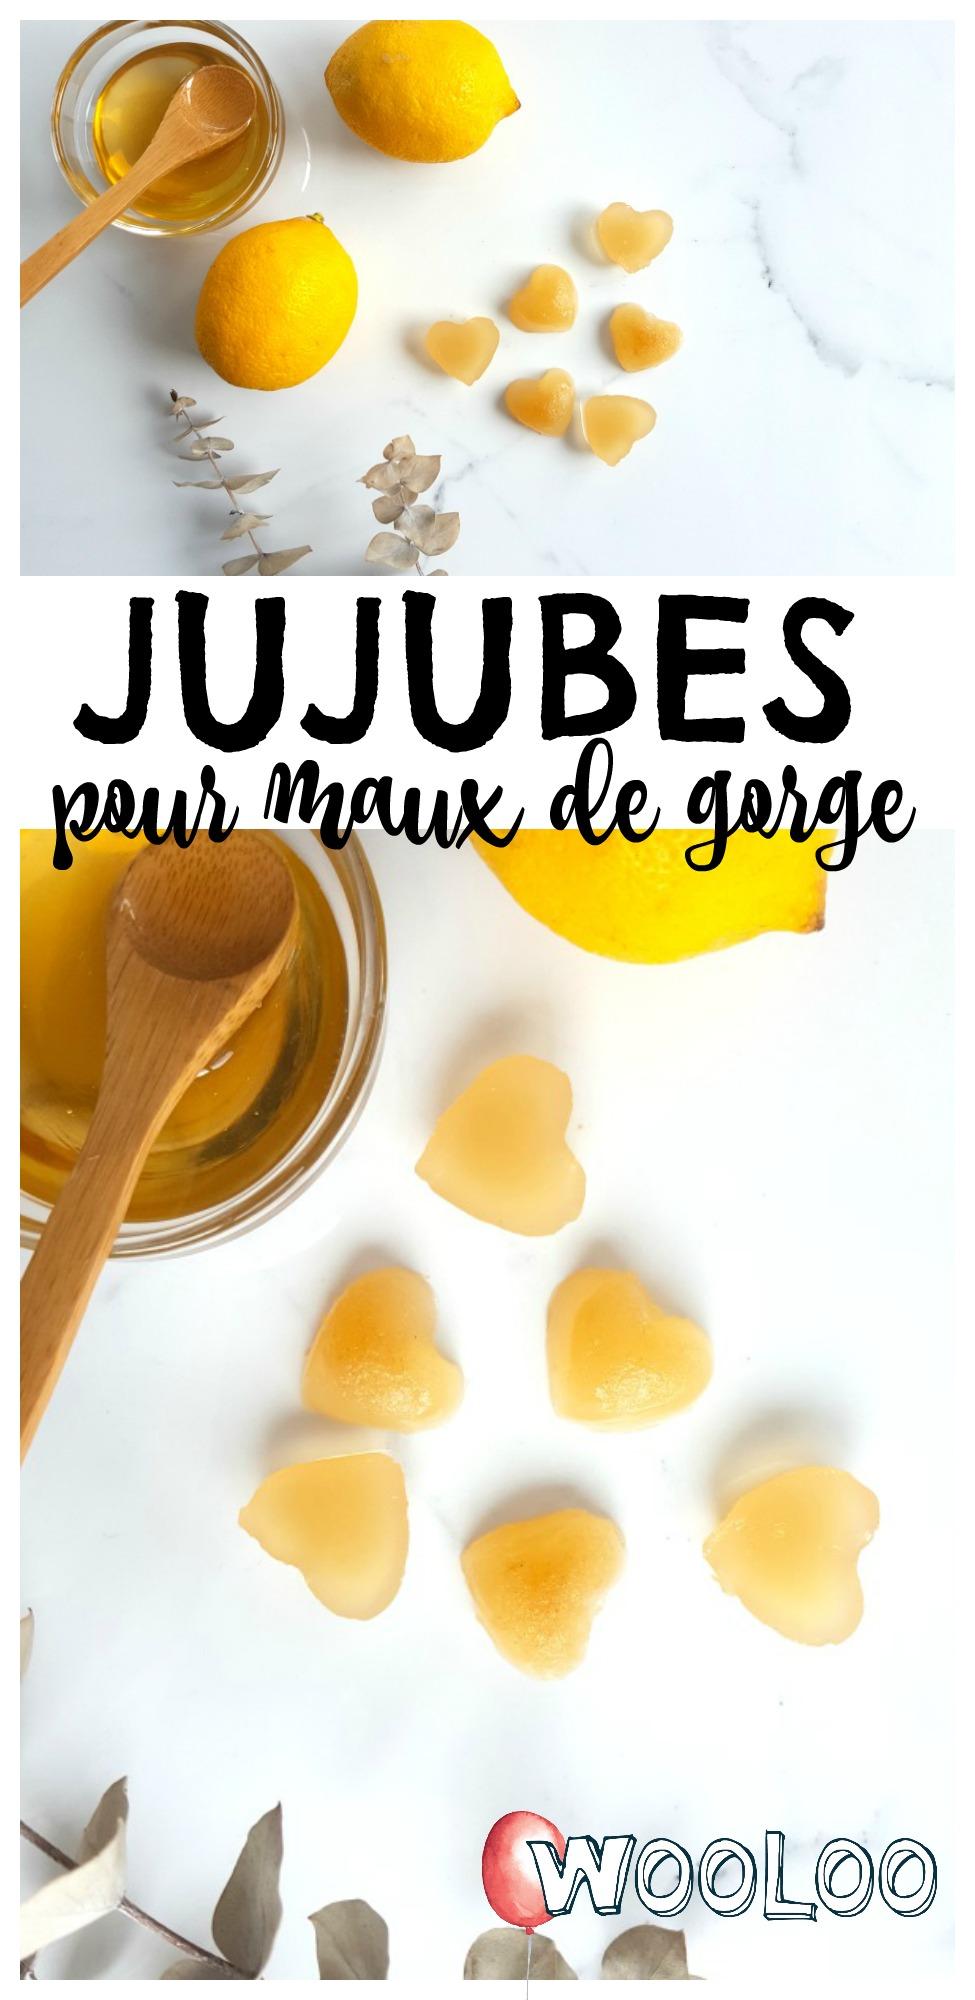 jujubes pour maux de gorge / wooloo